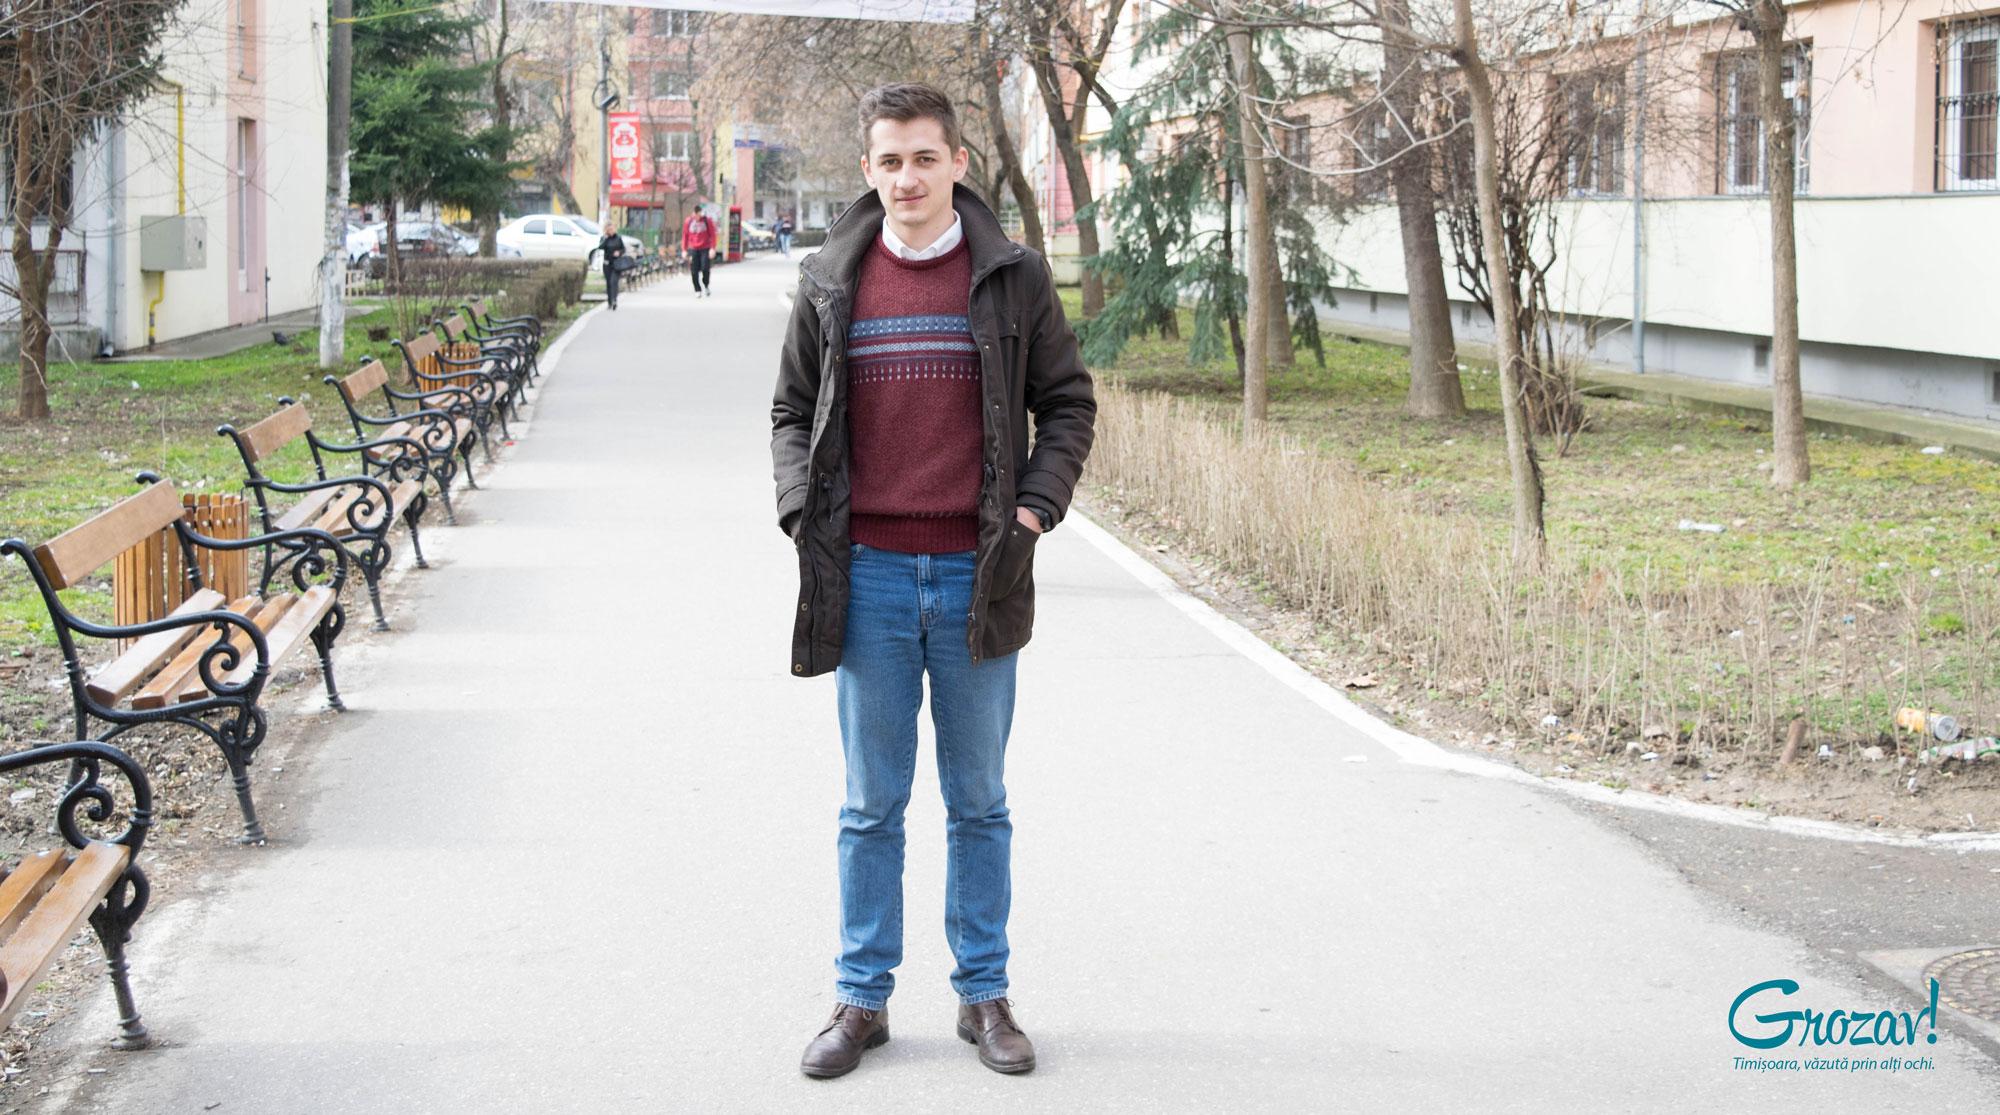 Bogdan-Plesa-Poveste-Grozav-Timisoara-Vazuta-prin-alti-ochi-grozav